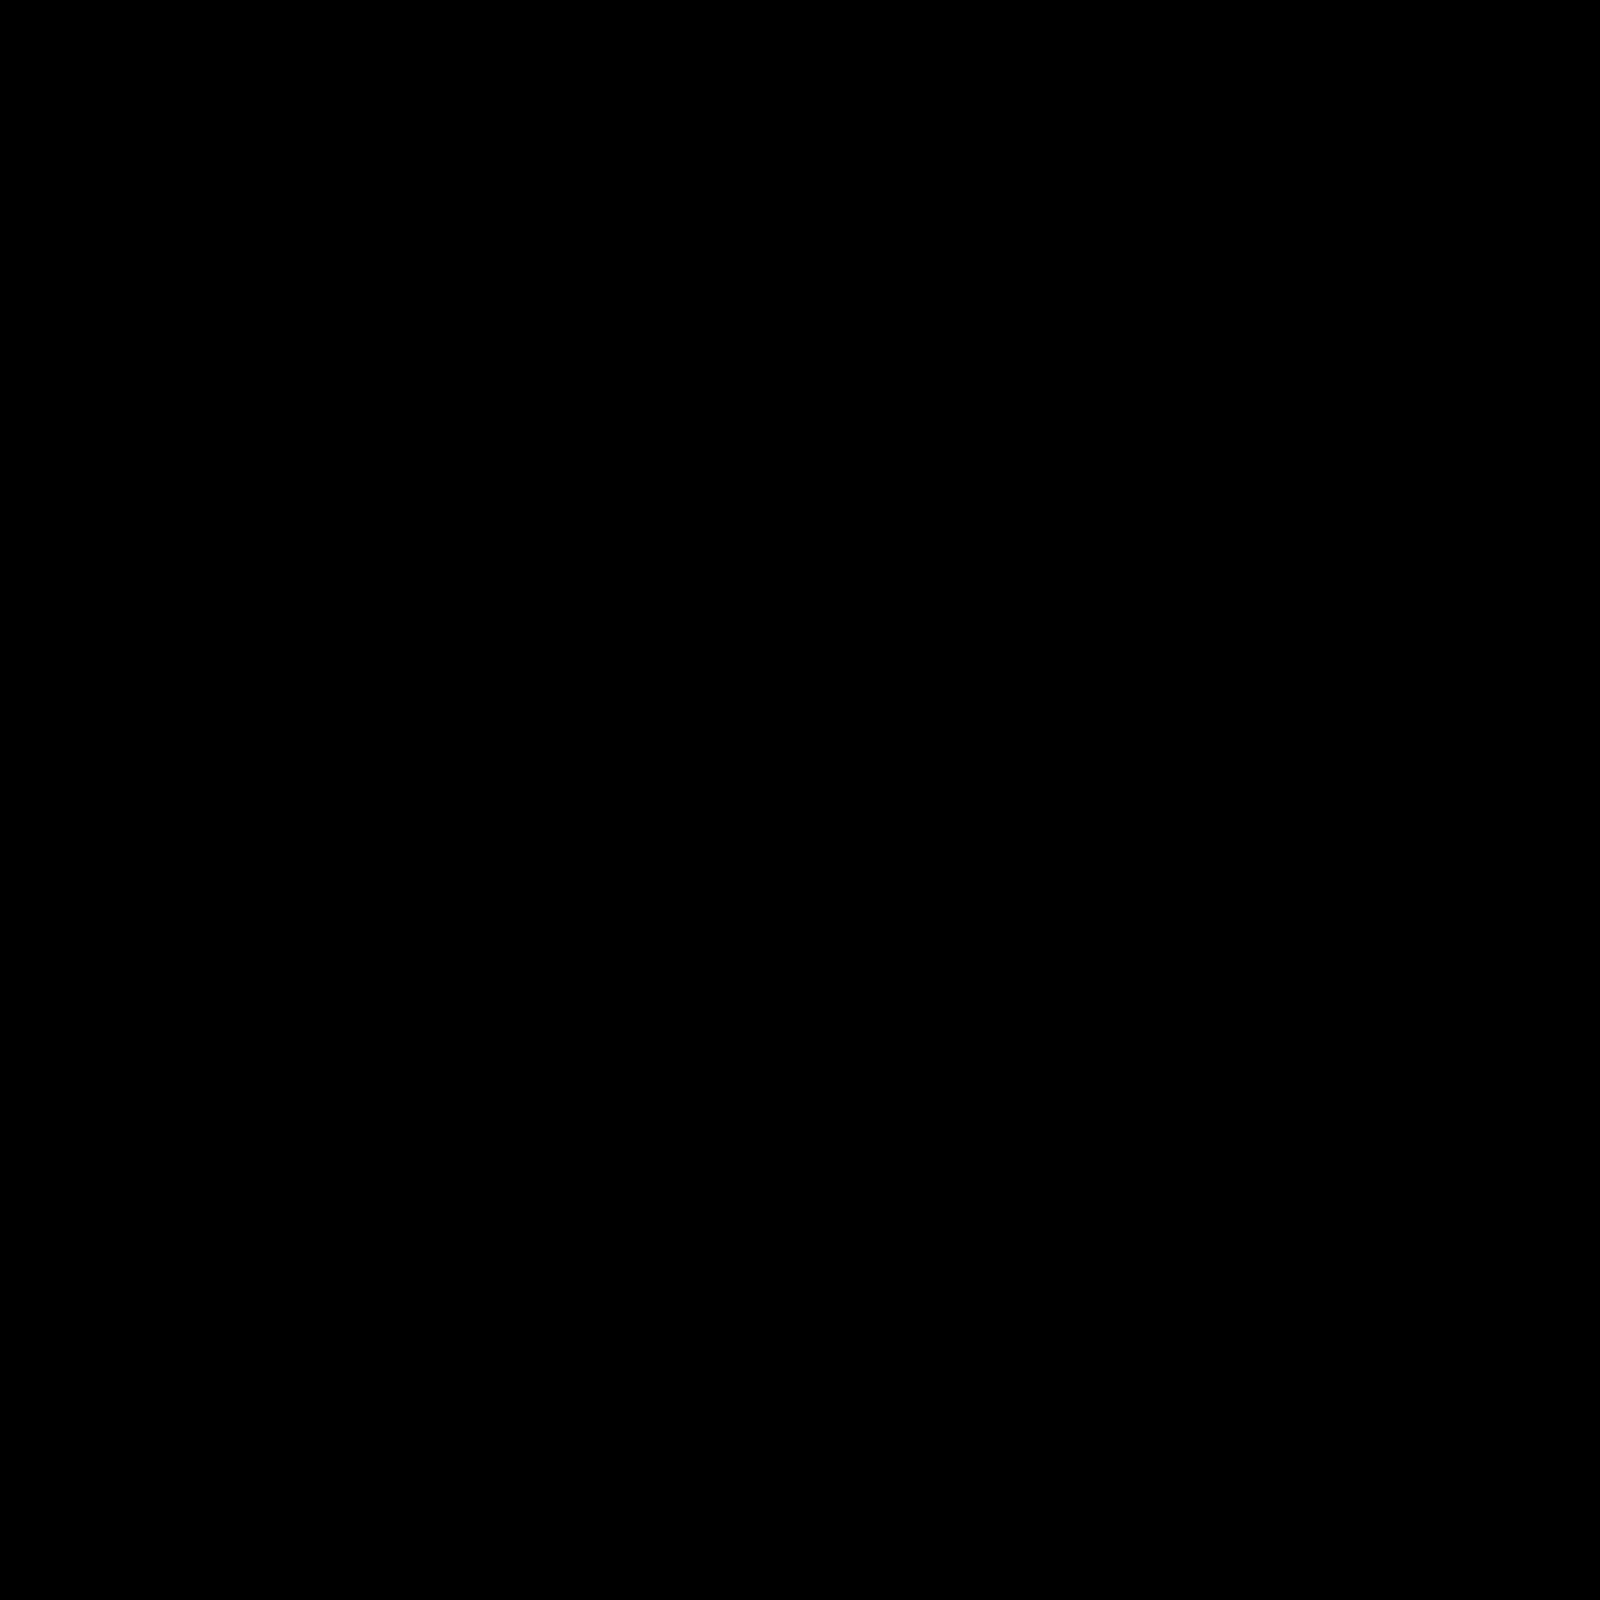 Monero Filled icon